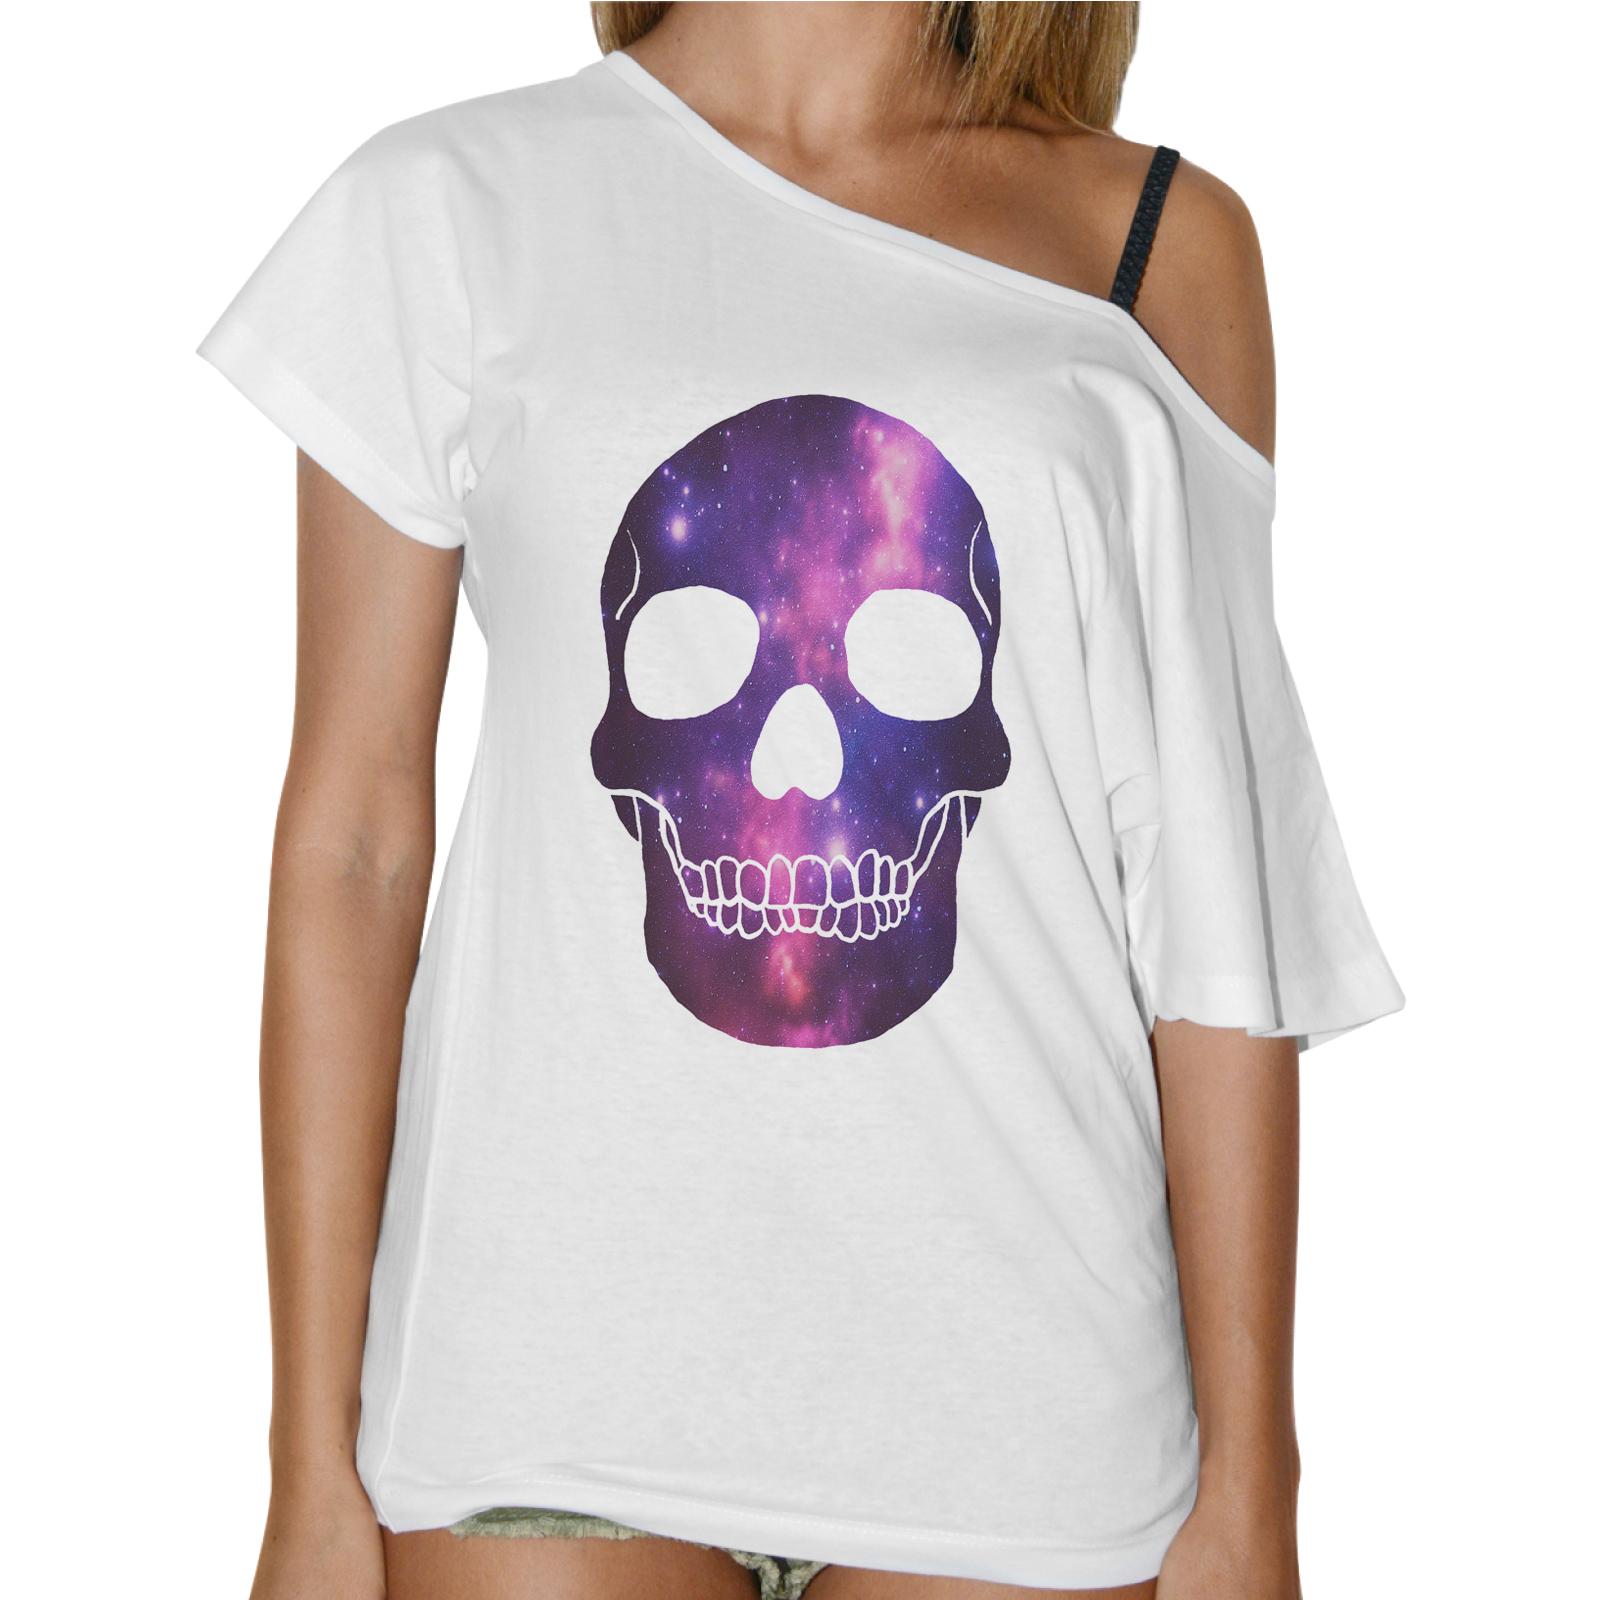 T-Shirt Donna Collo Barca SKULL GALAXY